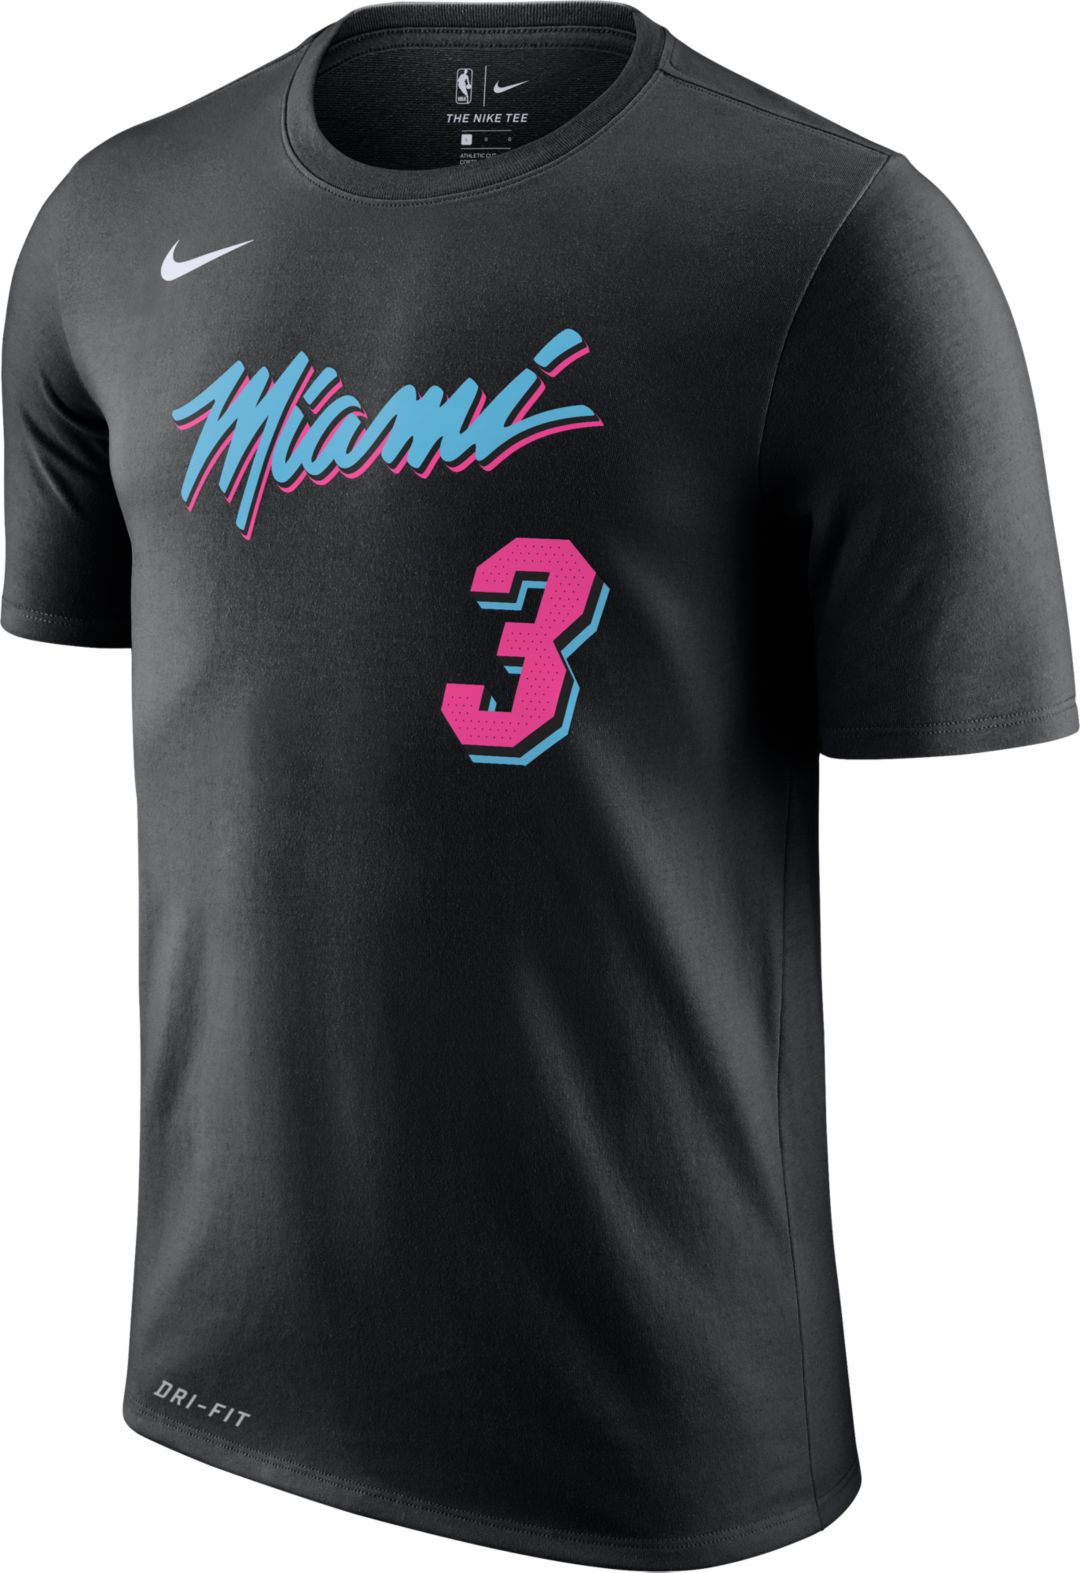 2a49fddab52bb Nike Youth Miami Heat Dwyane Wade Dri-FIT City Edition T-Shirt